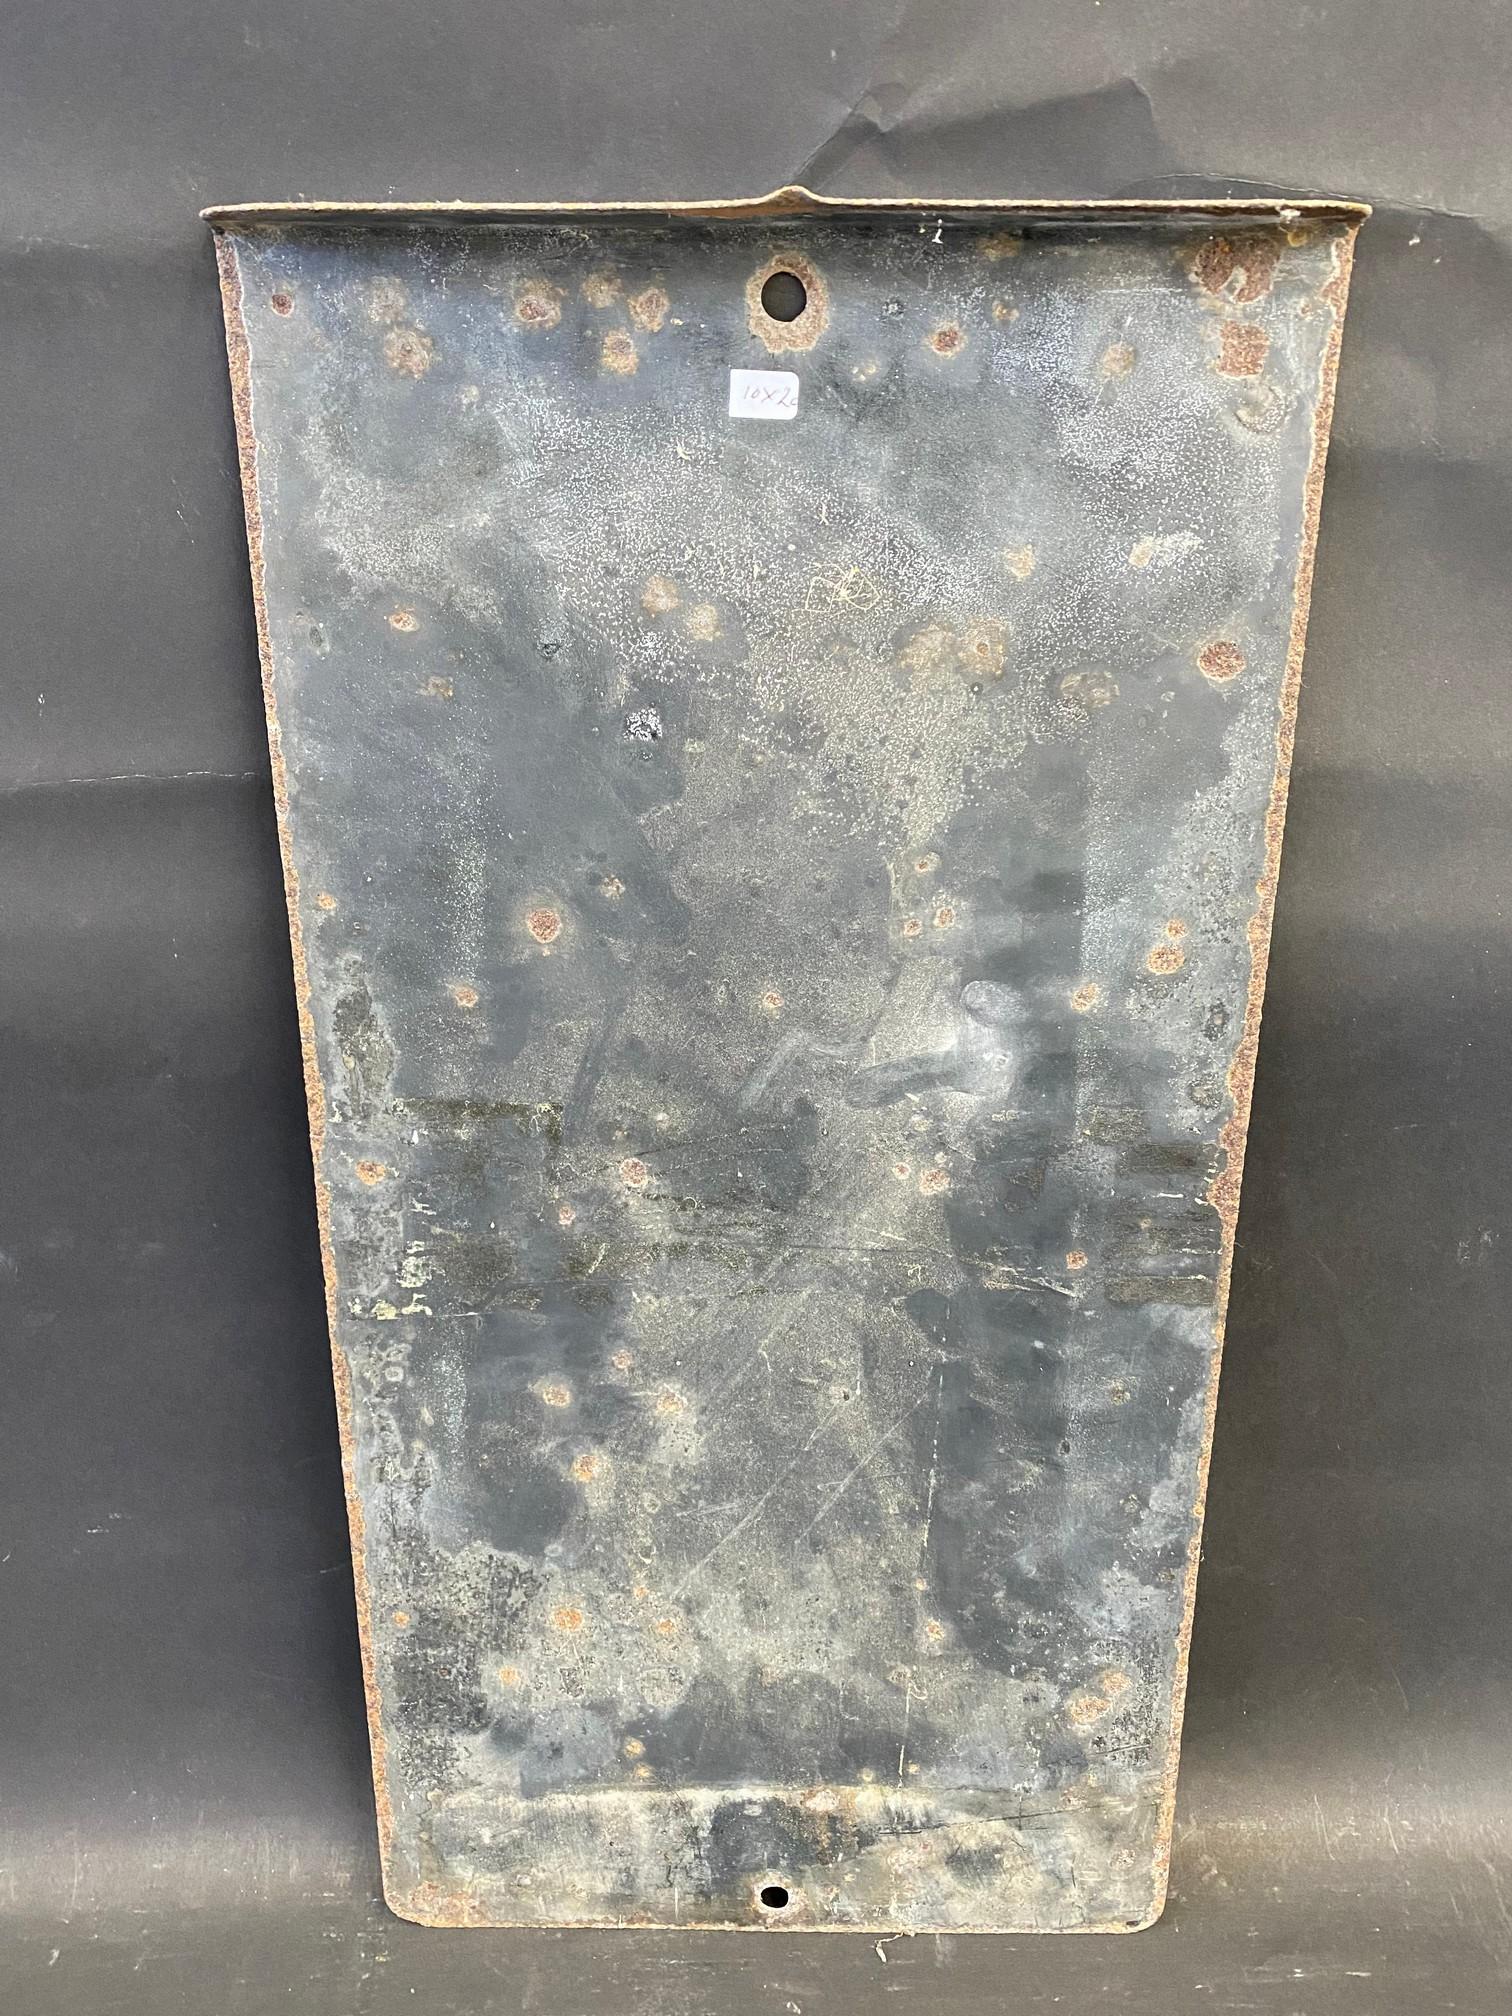 "An RAC Box 1 mile rectangular enamel sign, 10 x 20"". - Image 4 of 4"